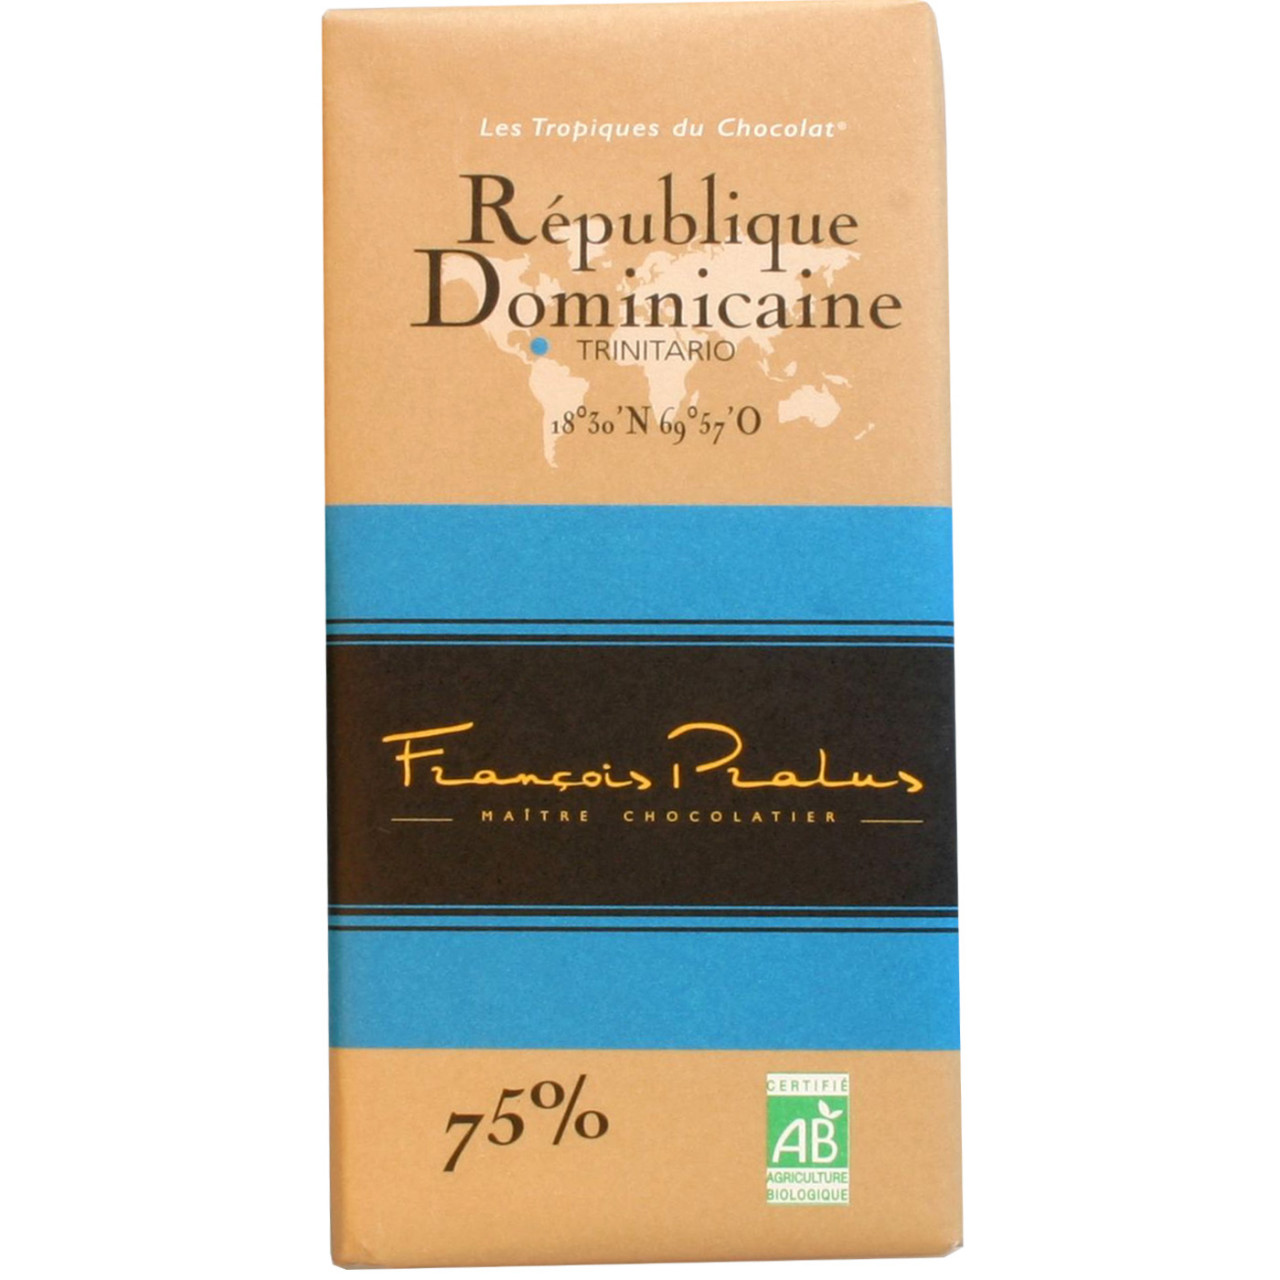 dunkle Schokolade, 75%, Domenikanische Republik, Trinitario, dark chocolate, chocolat noir, Herkunftsschokolade, Single Origin, Bean to Bar Schokolade - $seoKeywords- Chocolats-De-Luxe